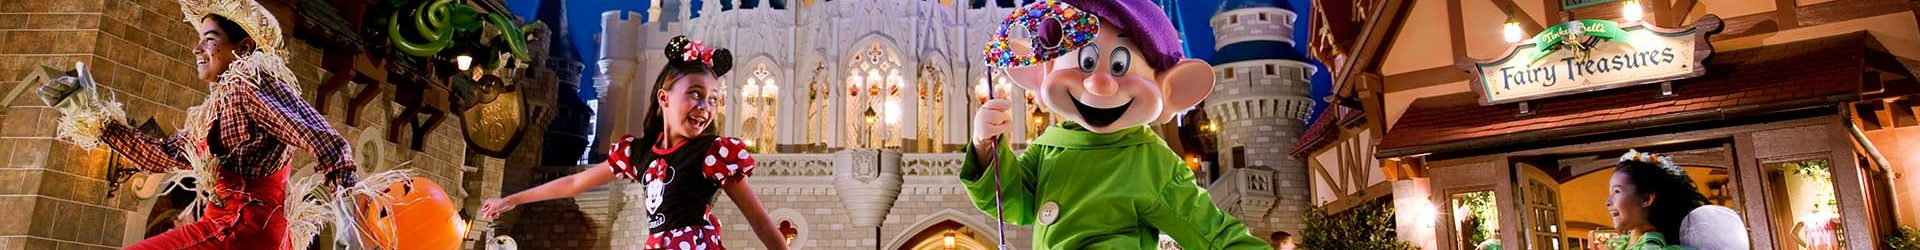 Magic Kingdom à Orlando en Floride